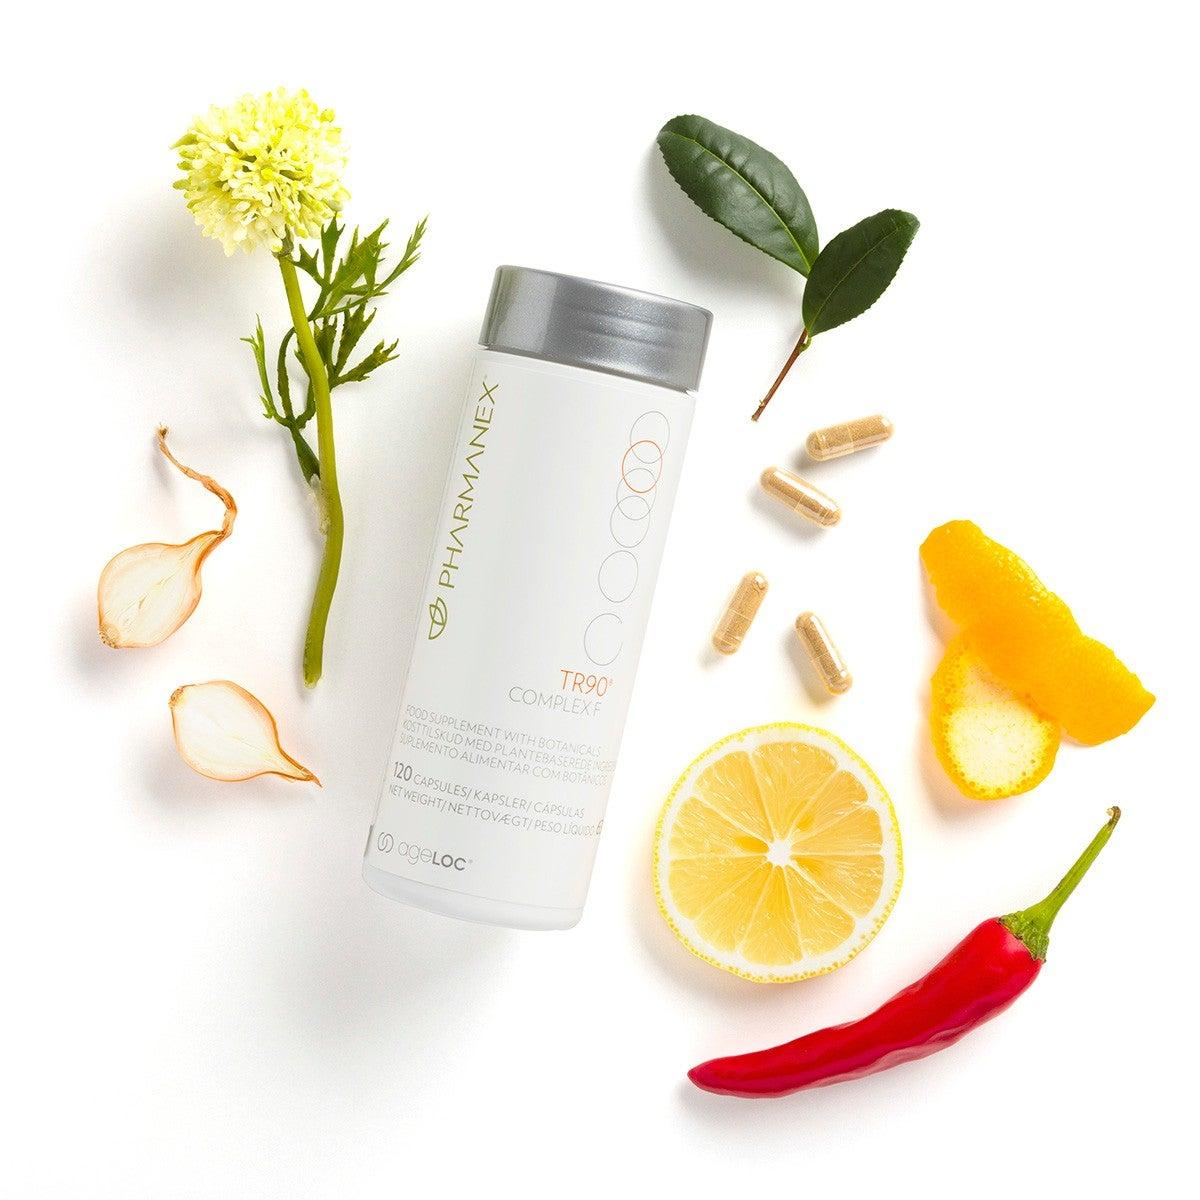 Pharmanex TR90 Complex F pill, botanical food supplement